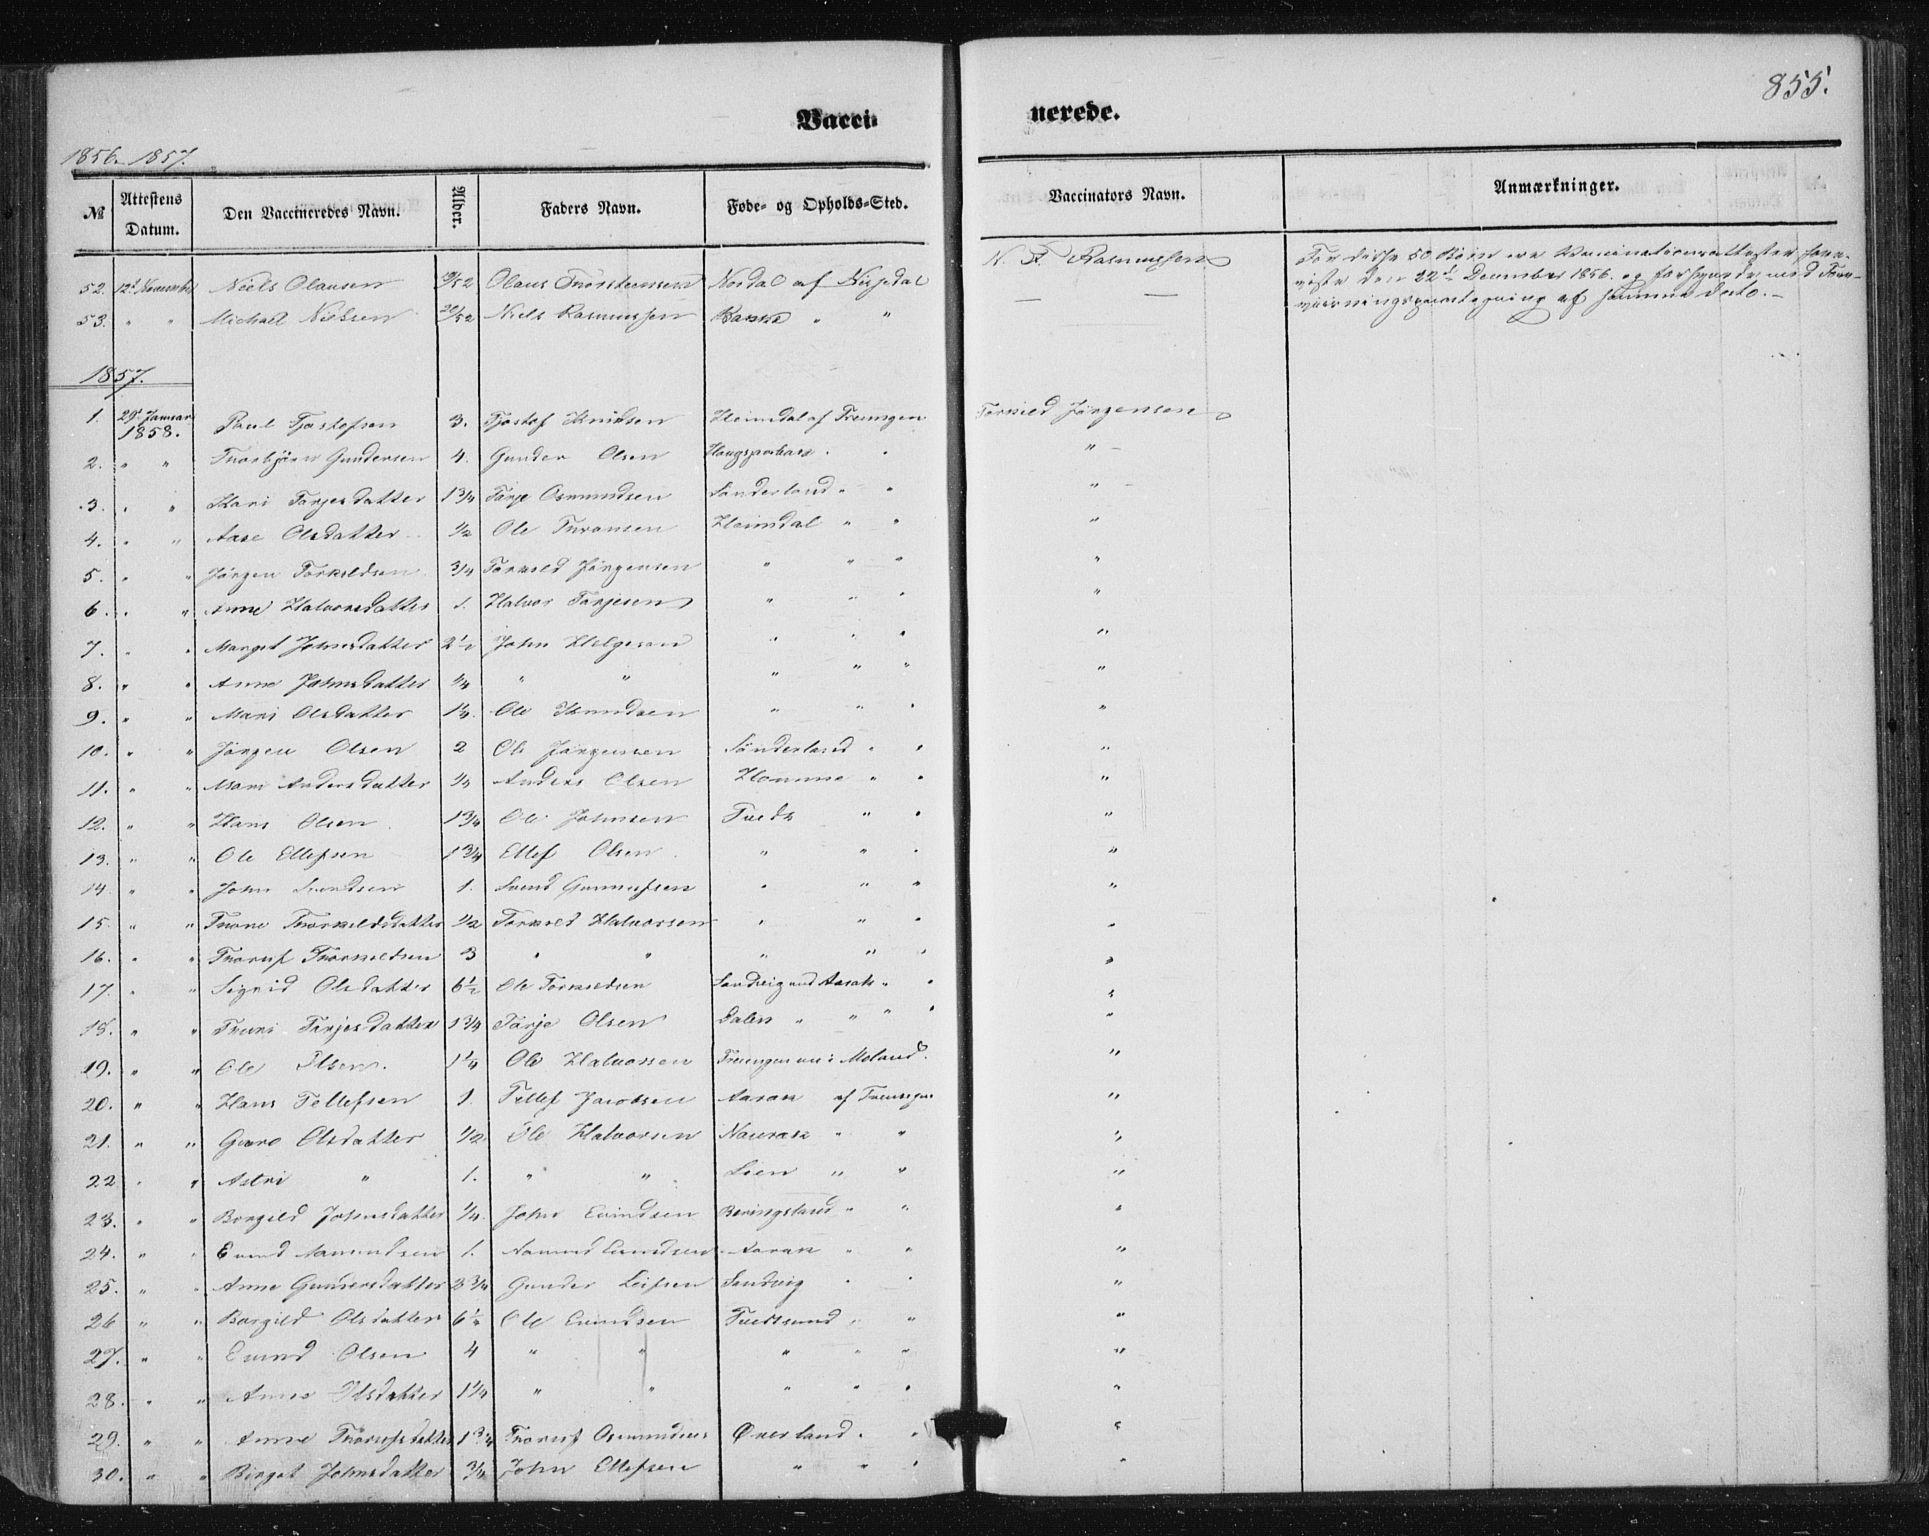 SAKO, Nissedal kirkebøker, F/Fa/L0003: Ministerialbok nr. I 3, 1846-1870, s. 854-855